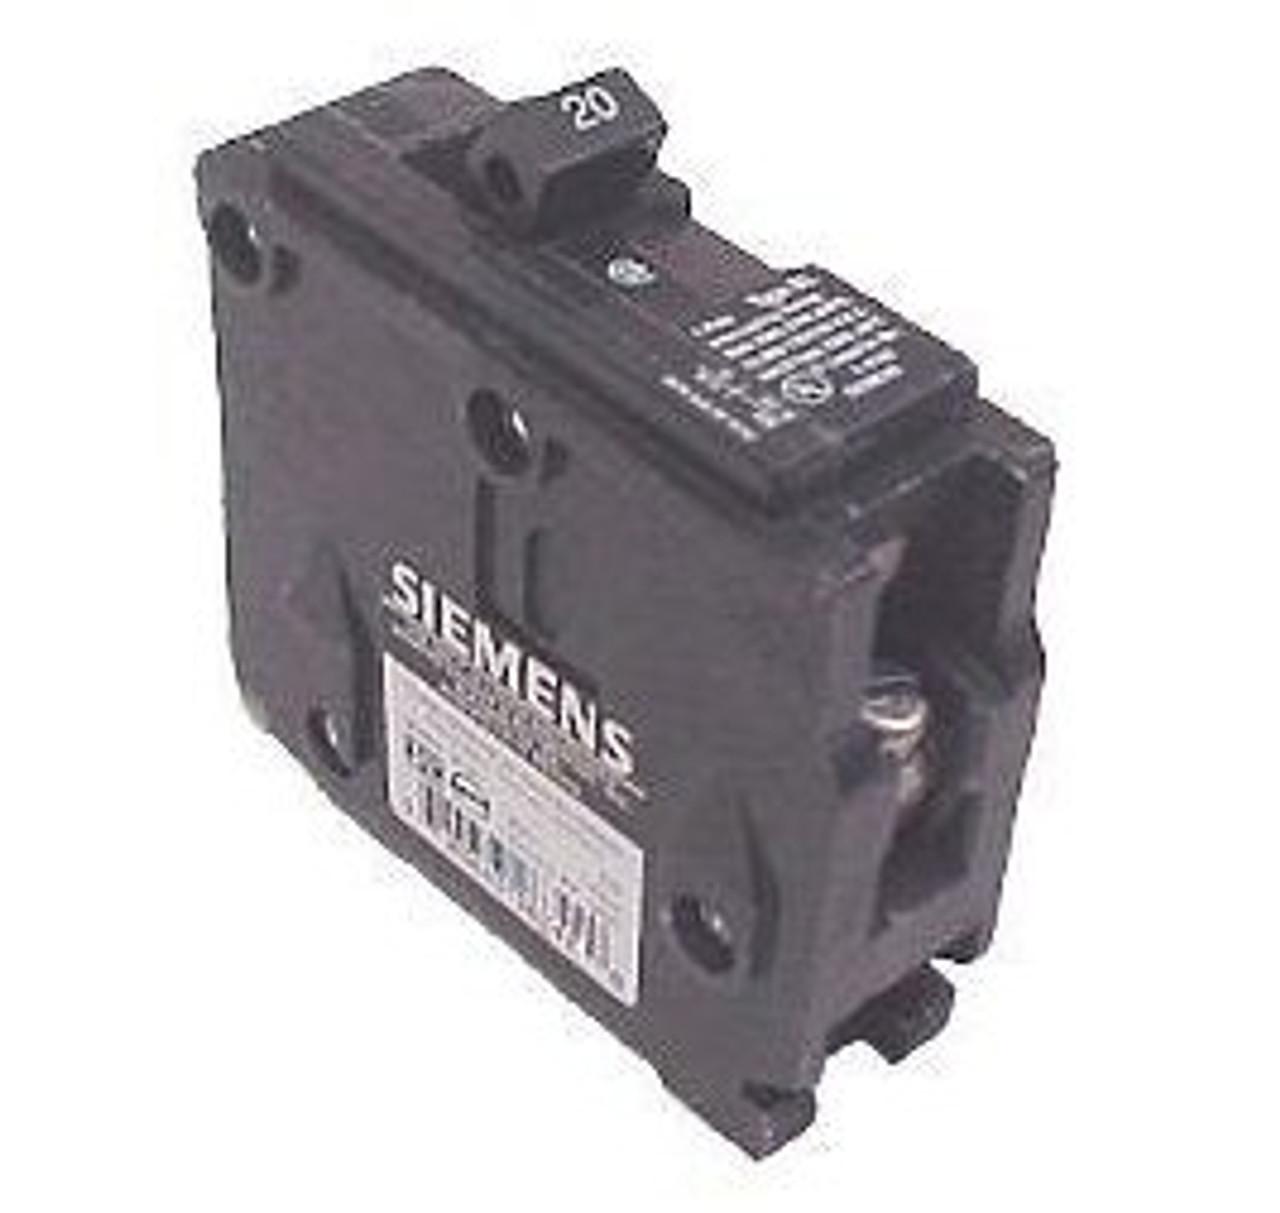 Siemens B115 1 Pole, 15 Amps, 120VAC, Type BL Circuit Breaker - Used